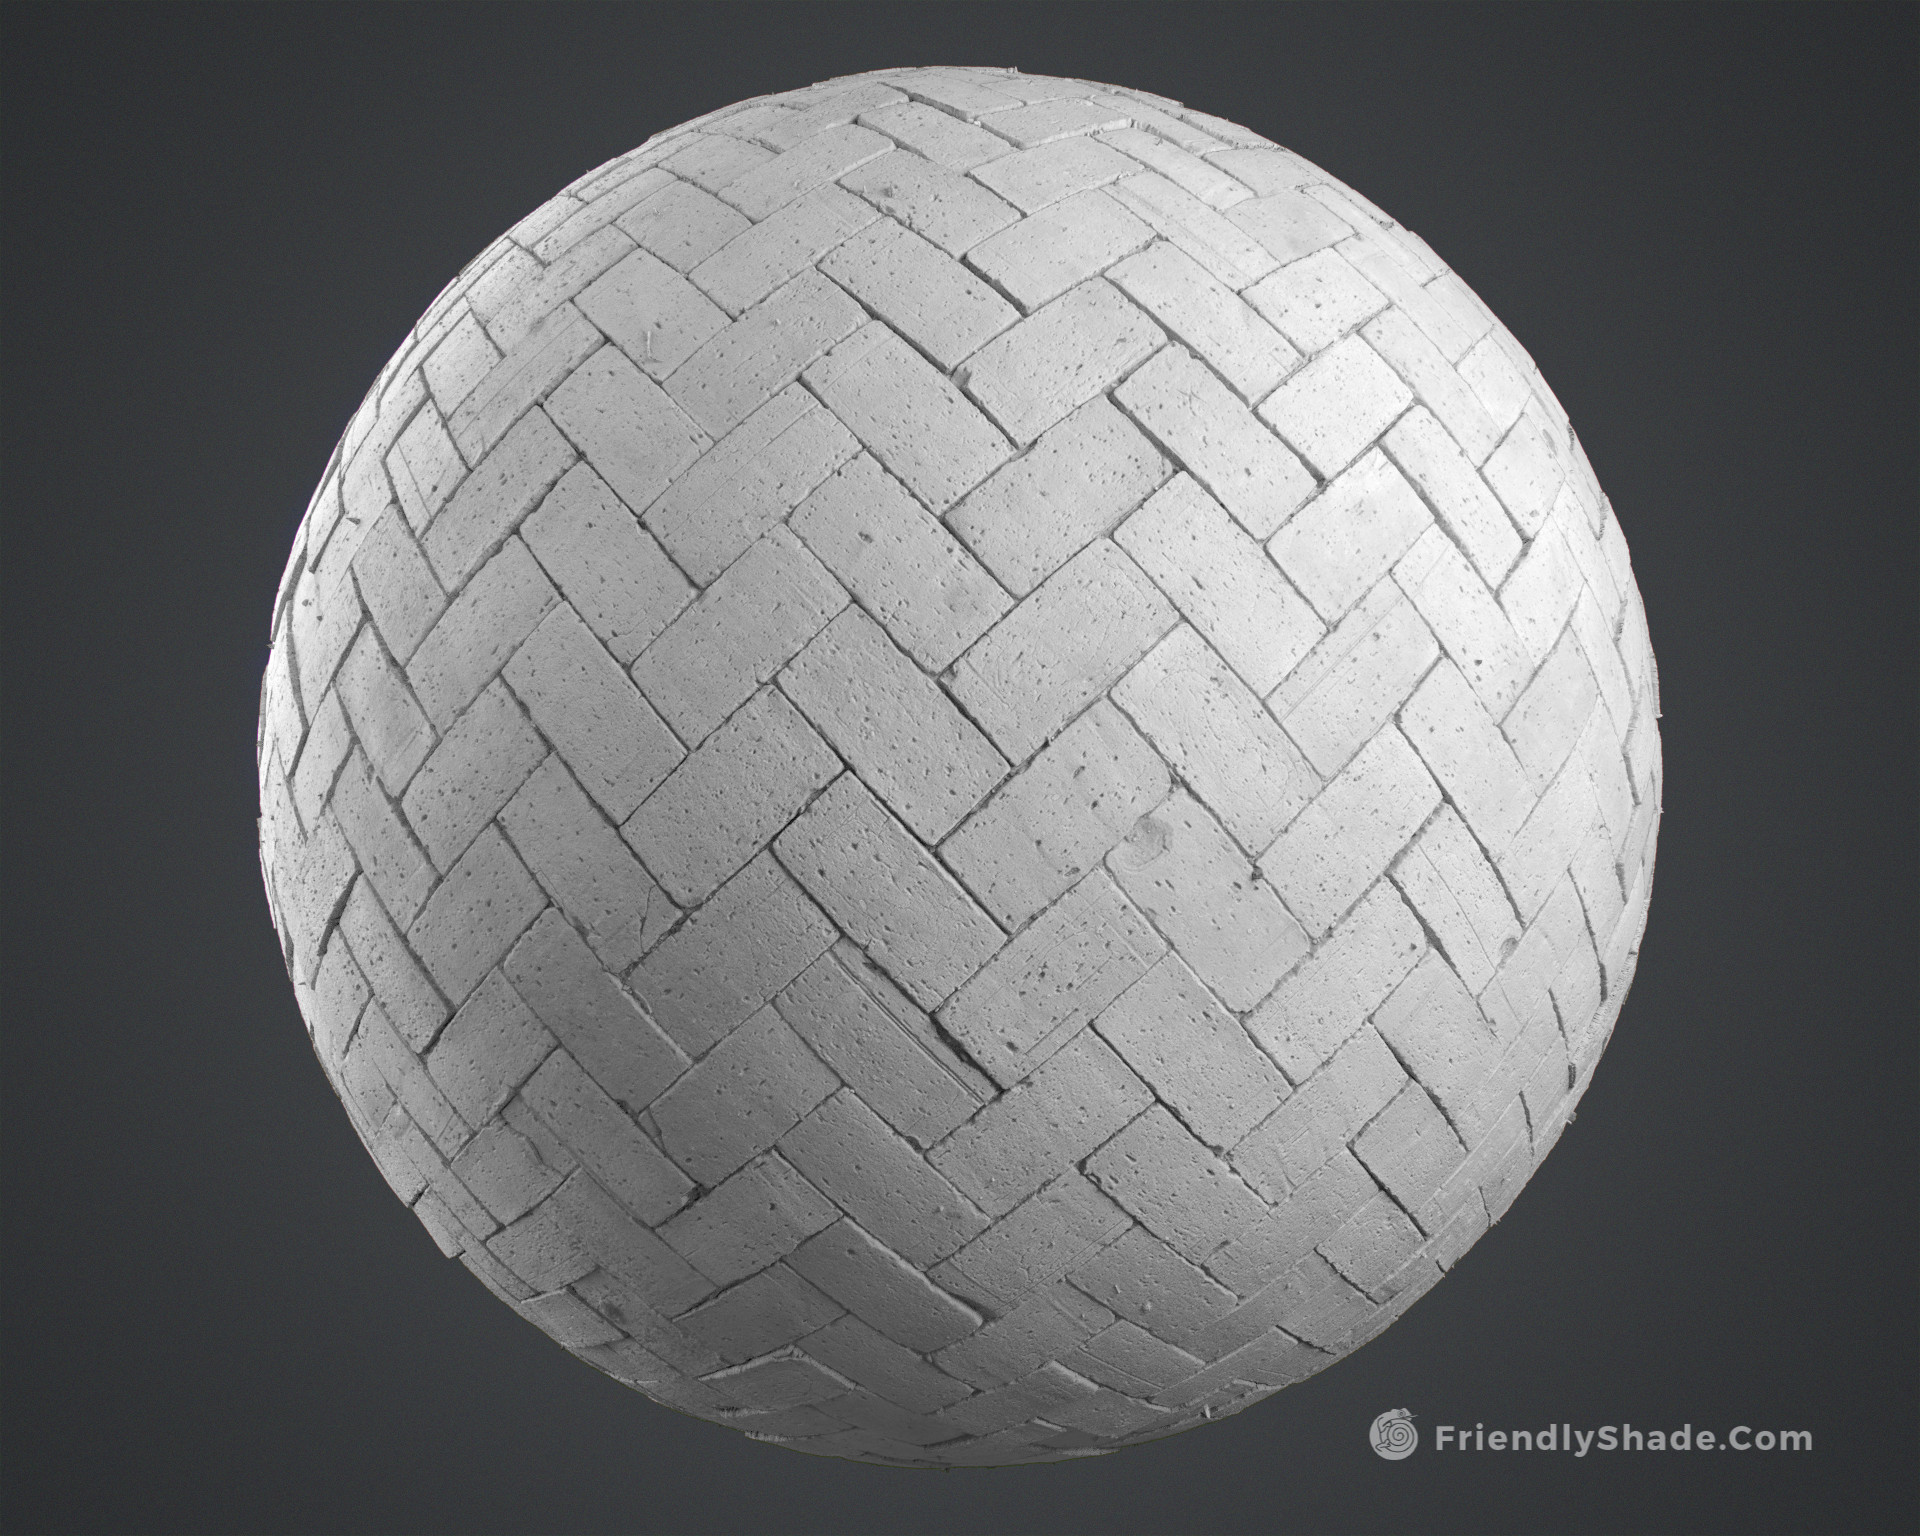 https://cdnb.artstation.com/p/assets/images/images/004/080/915/large/sebastian-zapata-render-01-clay.jpg?1480162446